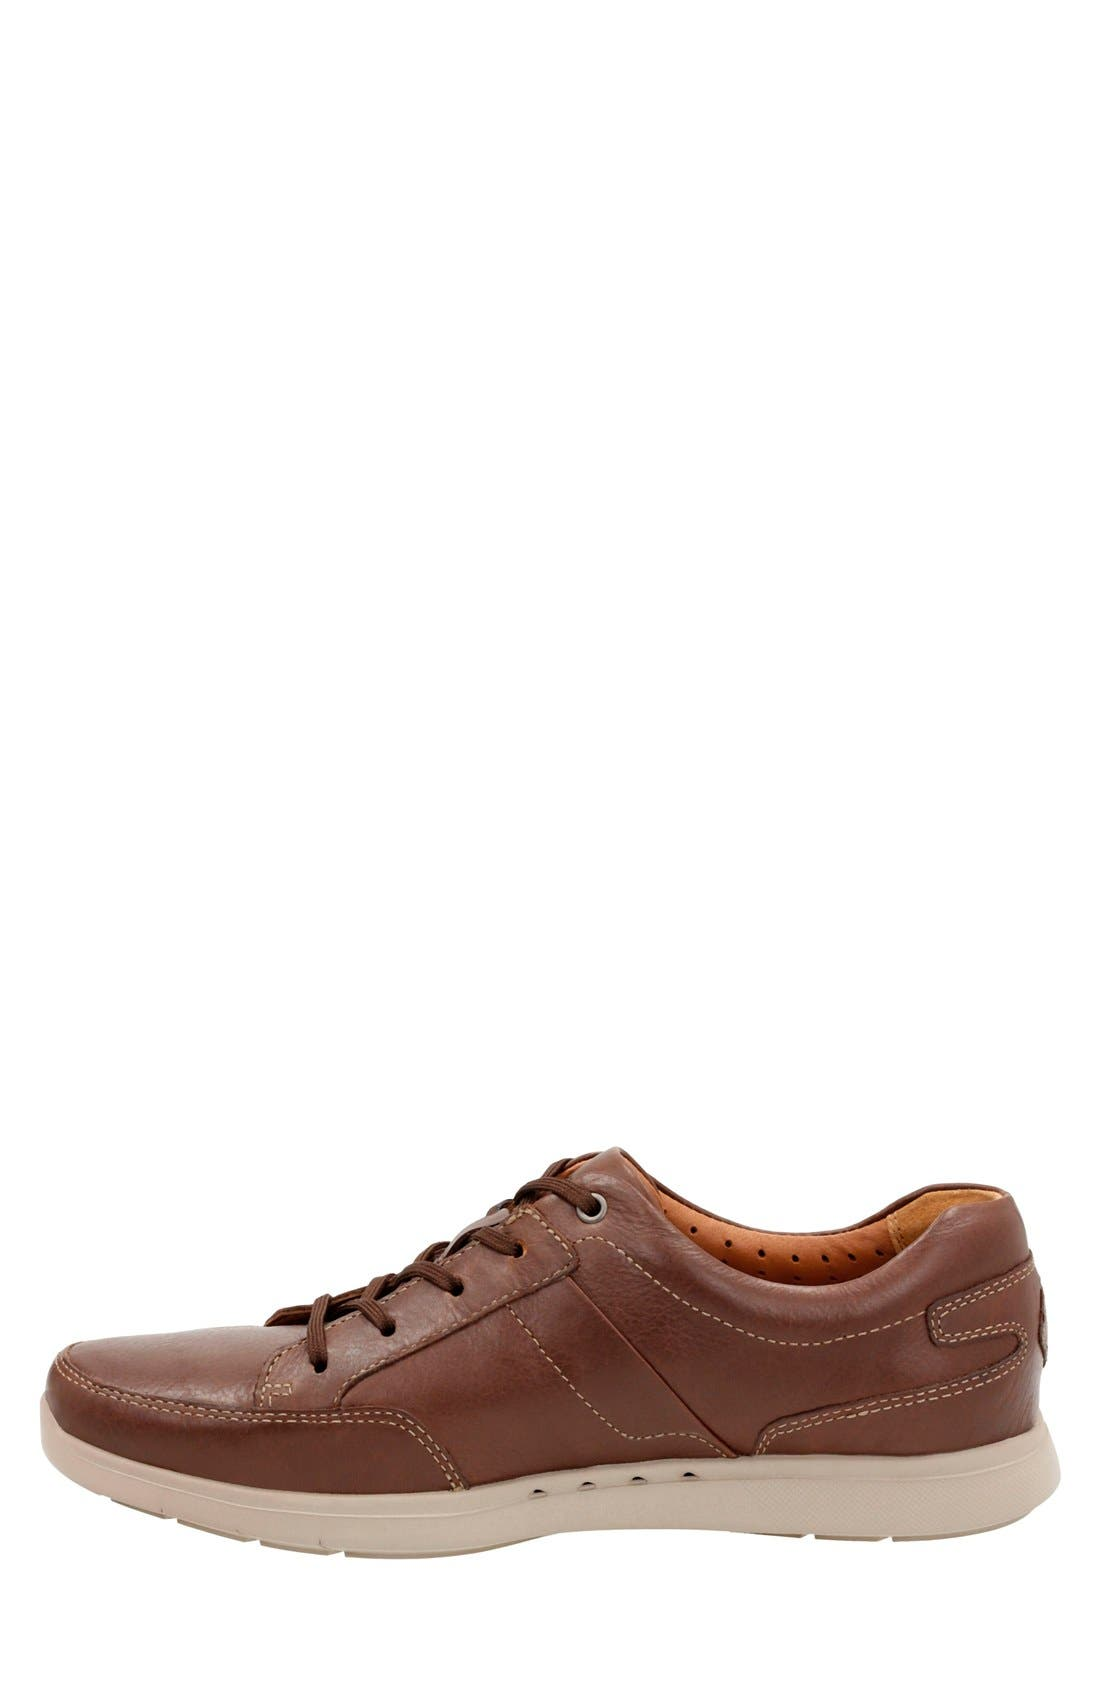 Alternate Image 2  - Clarks® 'Unstructured - Lomac' Leather Sneaker (Men)